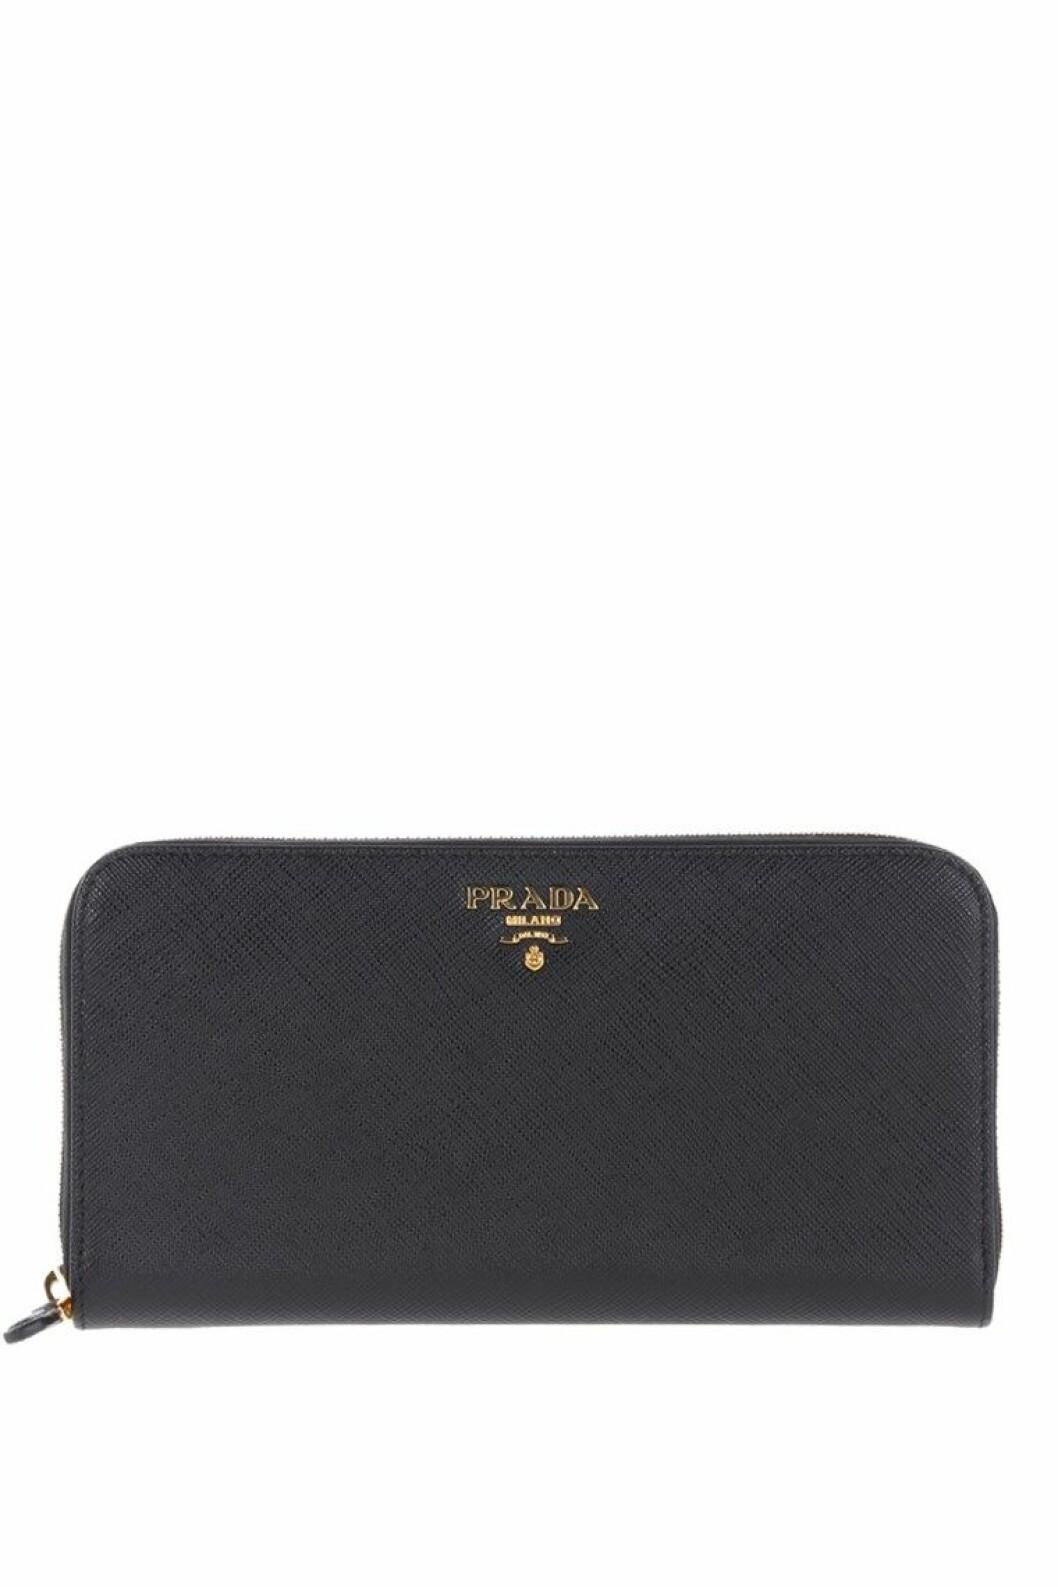 Plånbok från Prada